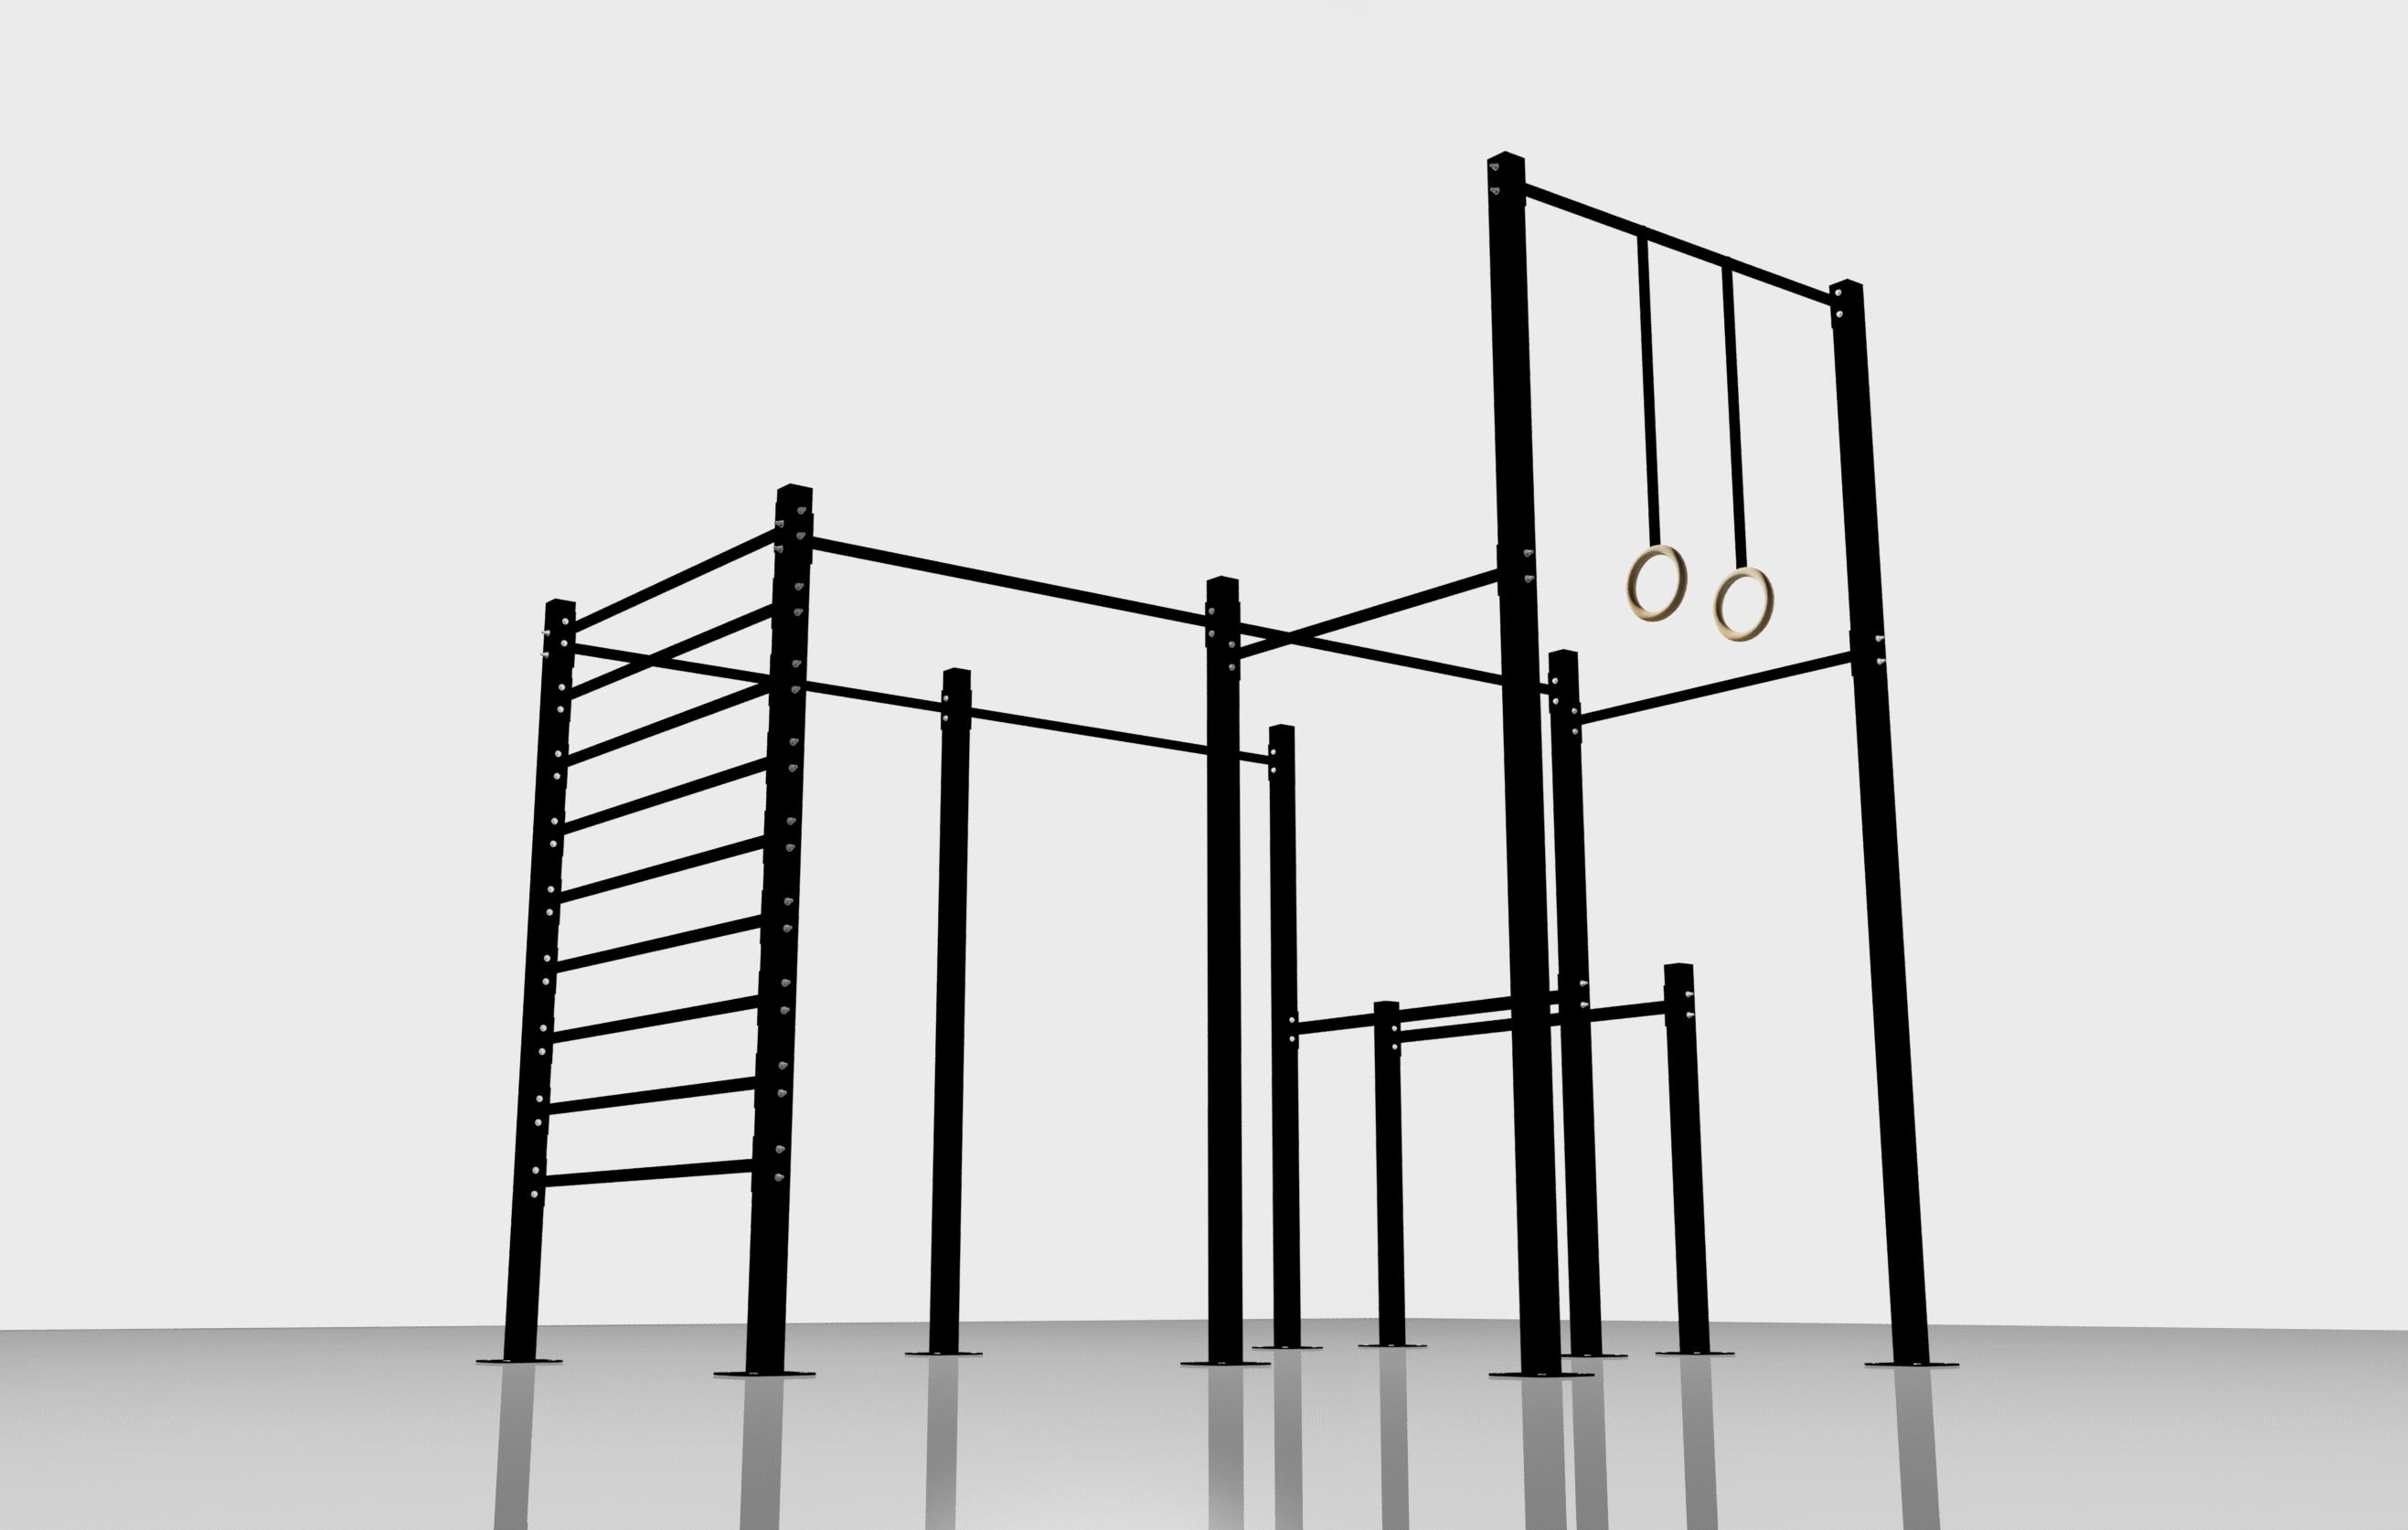 Racks jaulas y gimnasios para crossfit calistenia y for Gimnacio o gimnasio